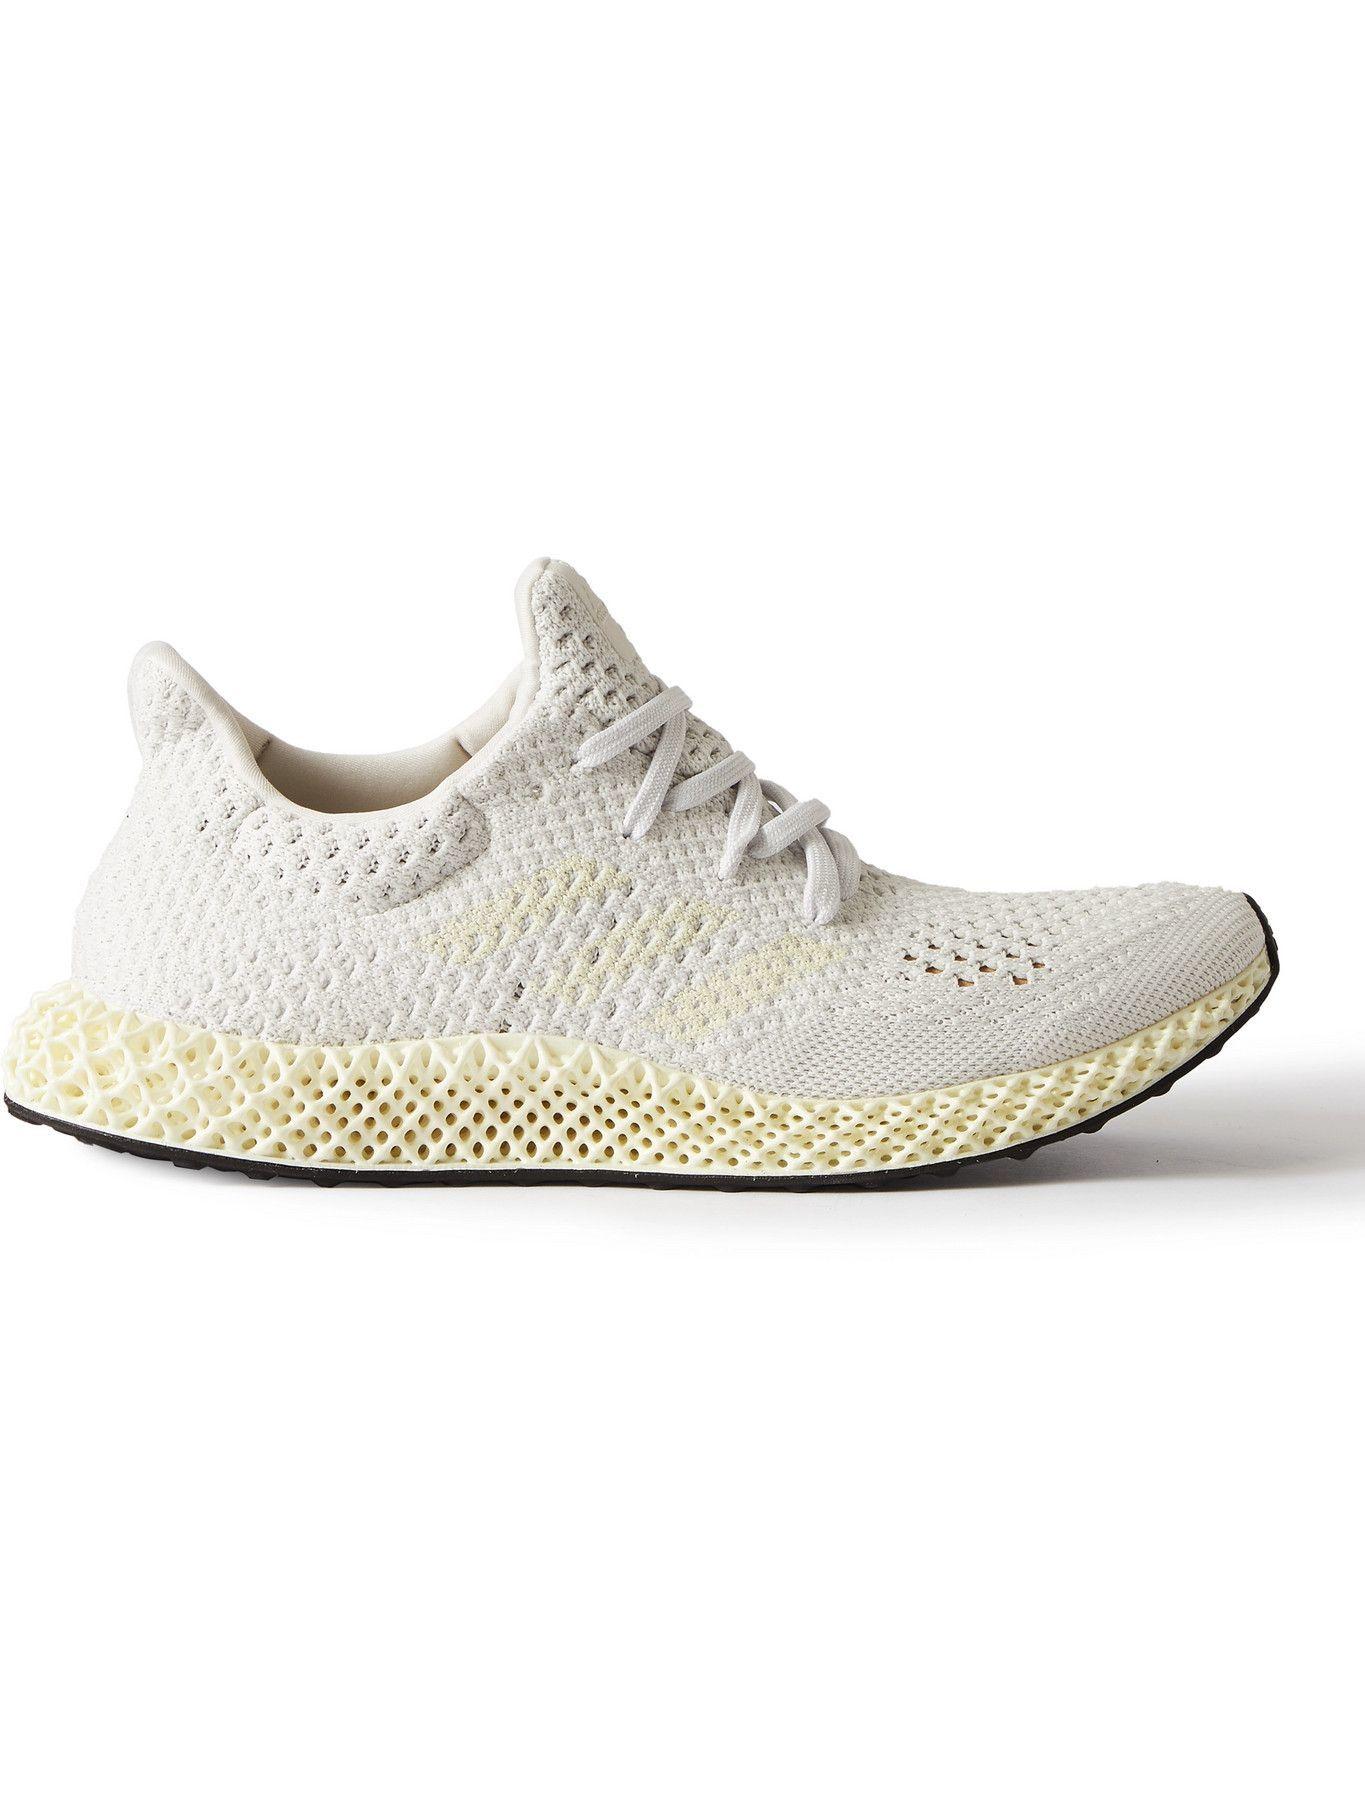 Photo: adidas Sport - 4D Futurecraft Primeknit Sneakers - Gray